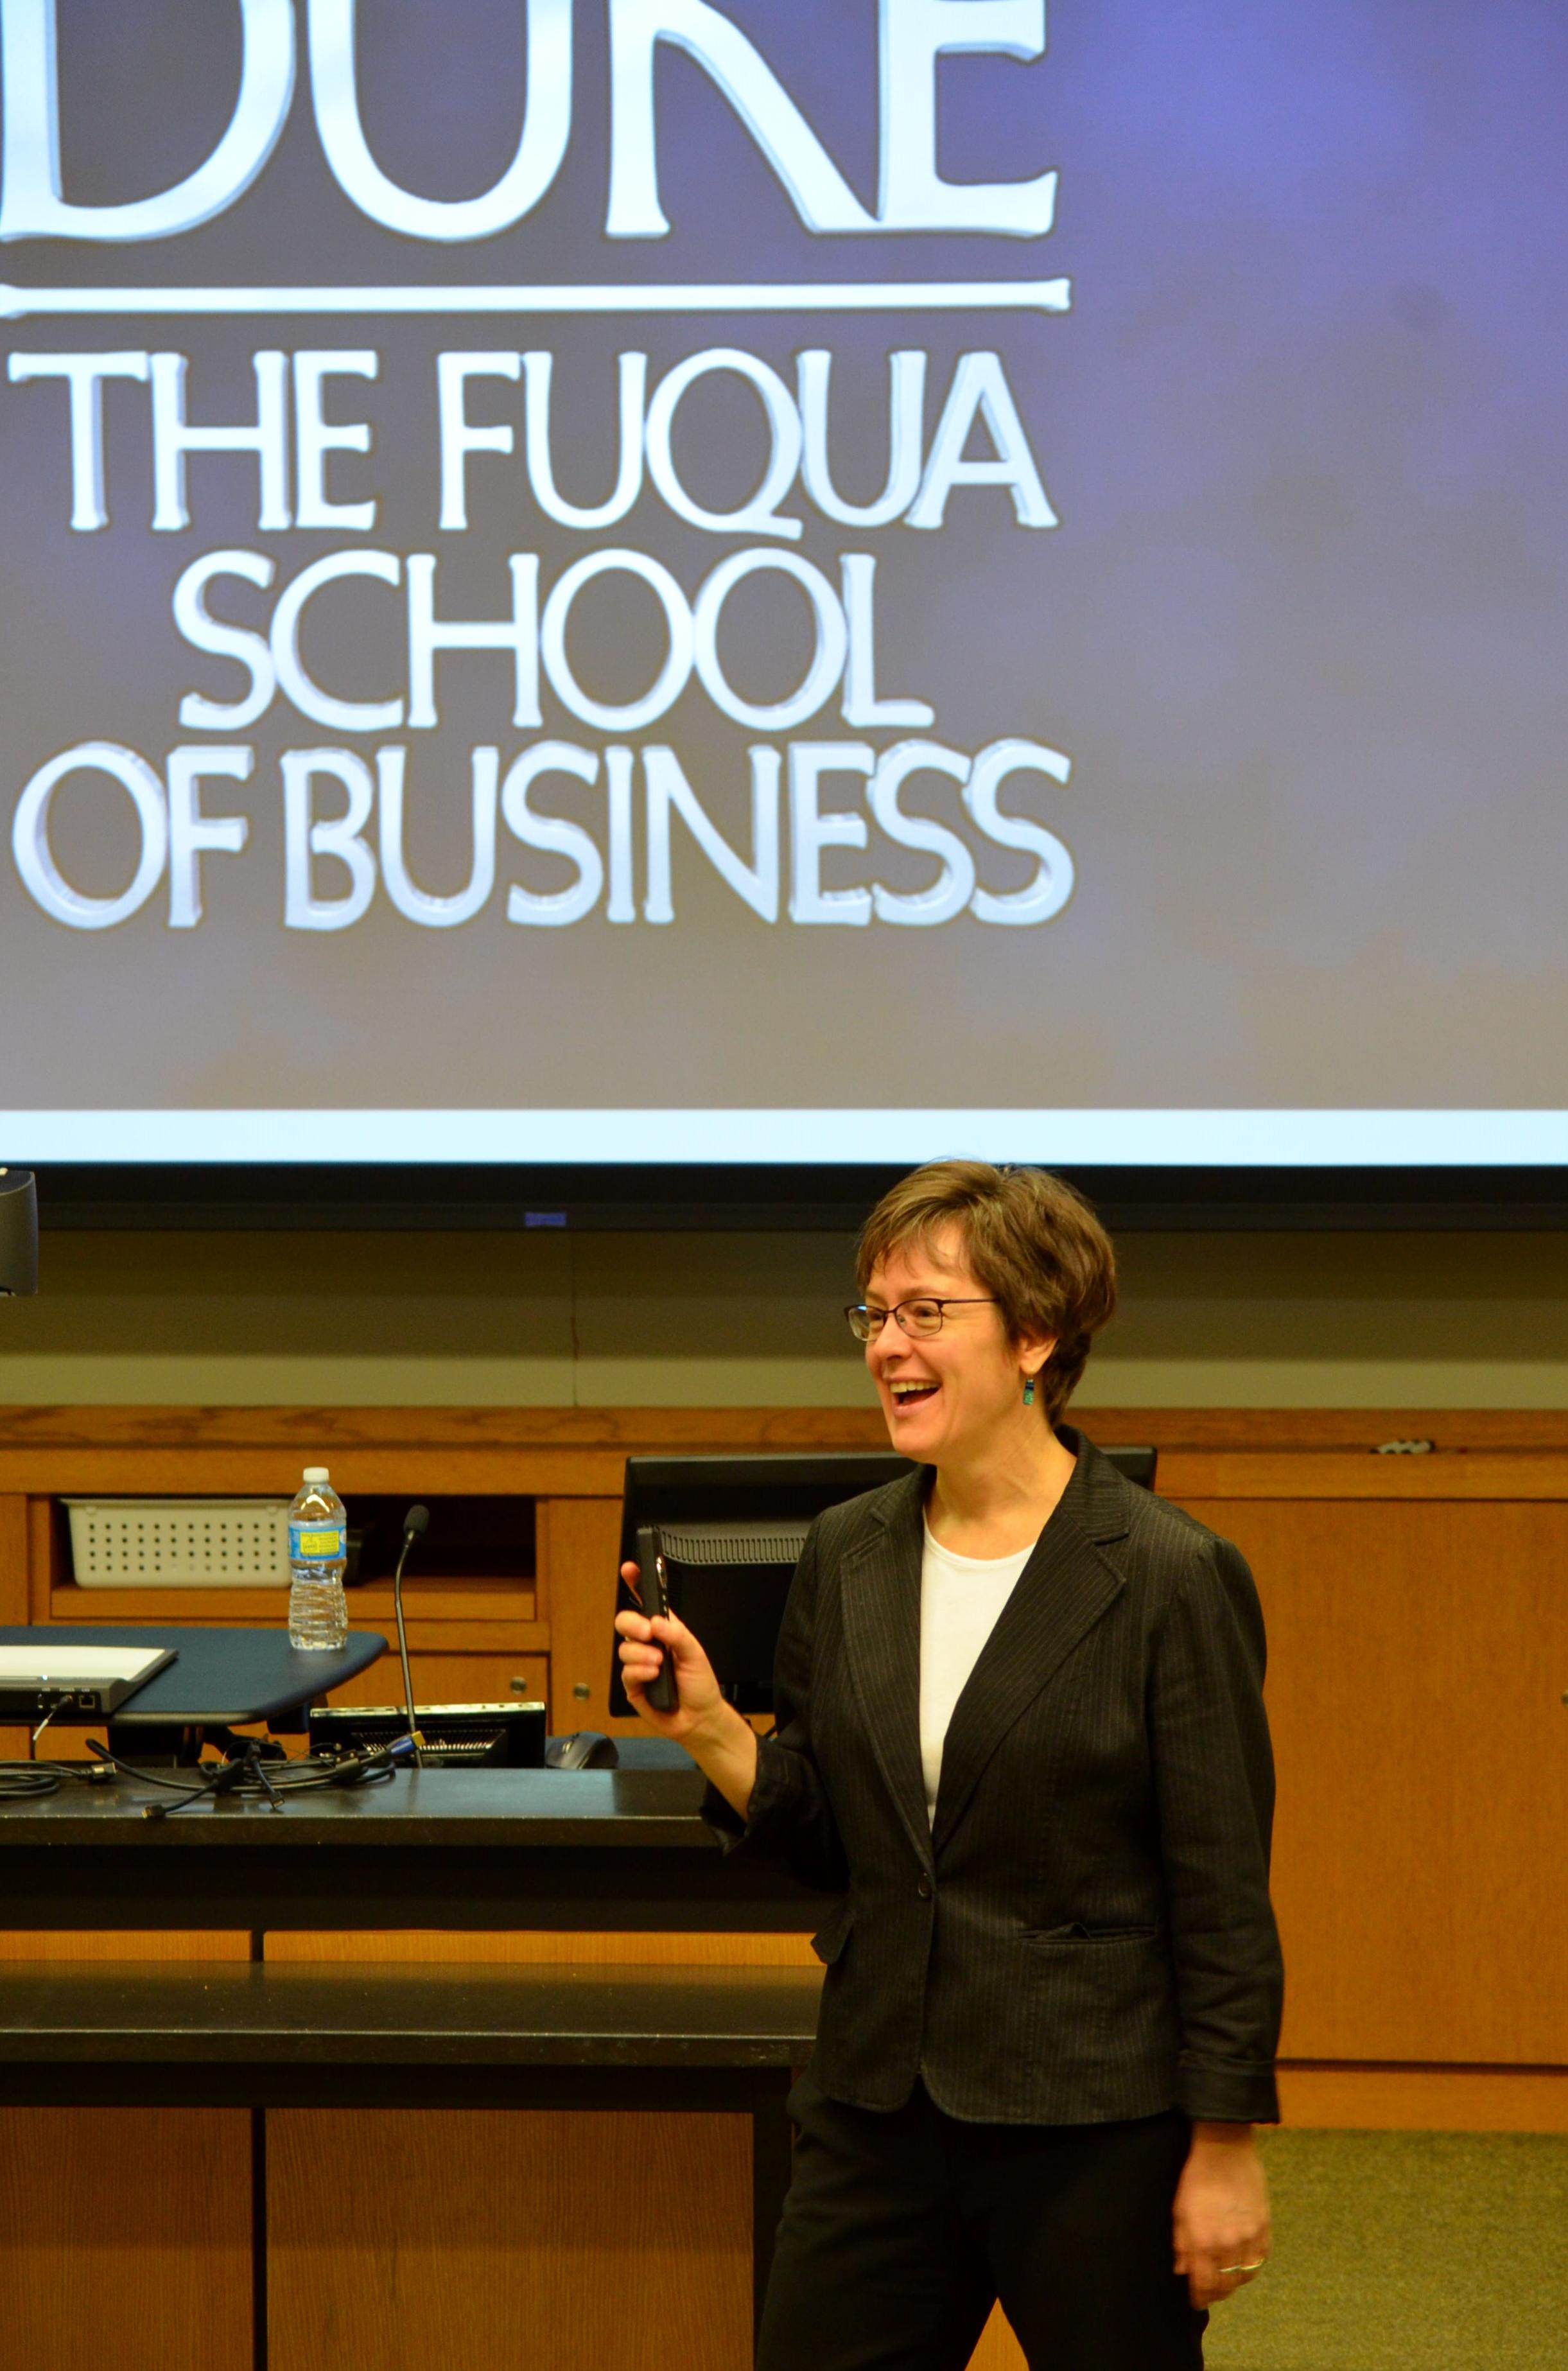 Mackenzie Sullivan, Sector Director for Social Impact & Sustainability Careers in Fuqua's Career Management Center